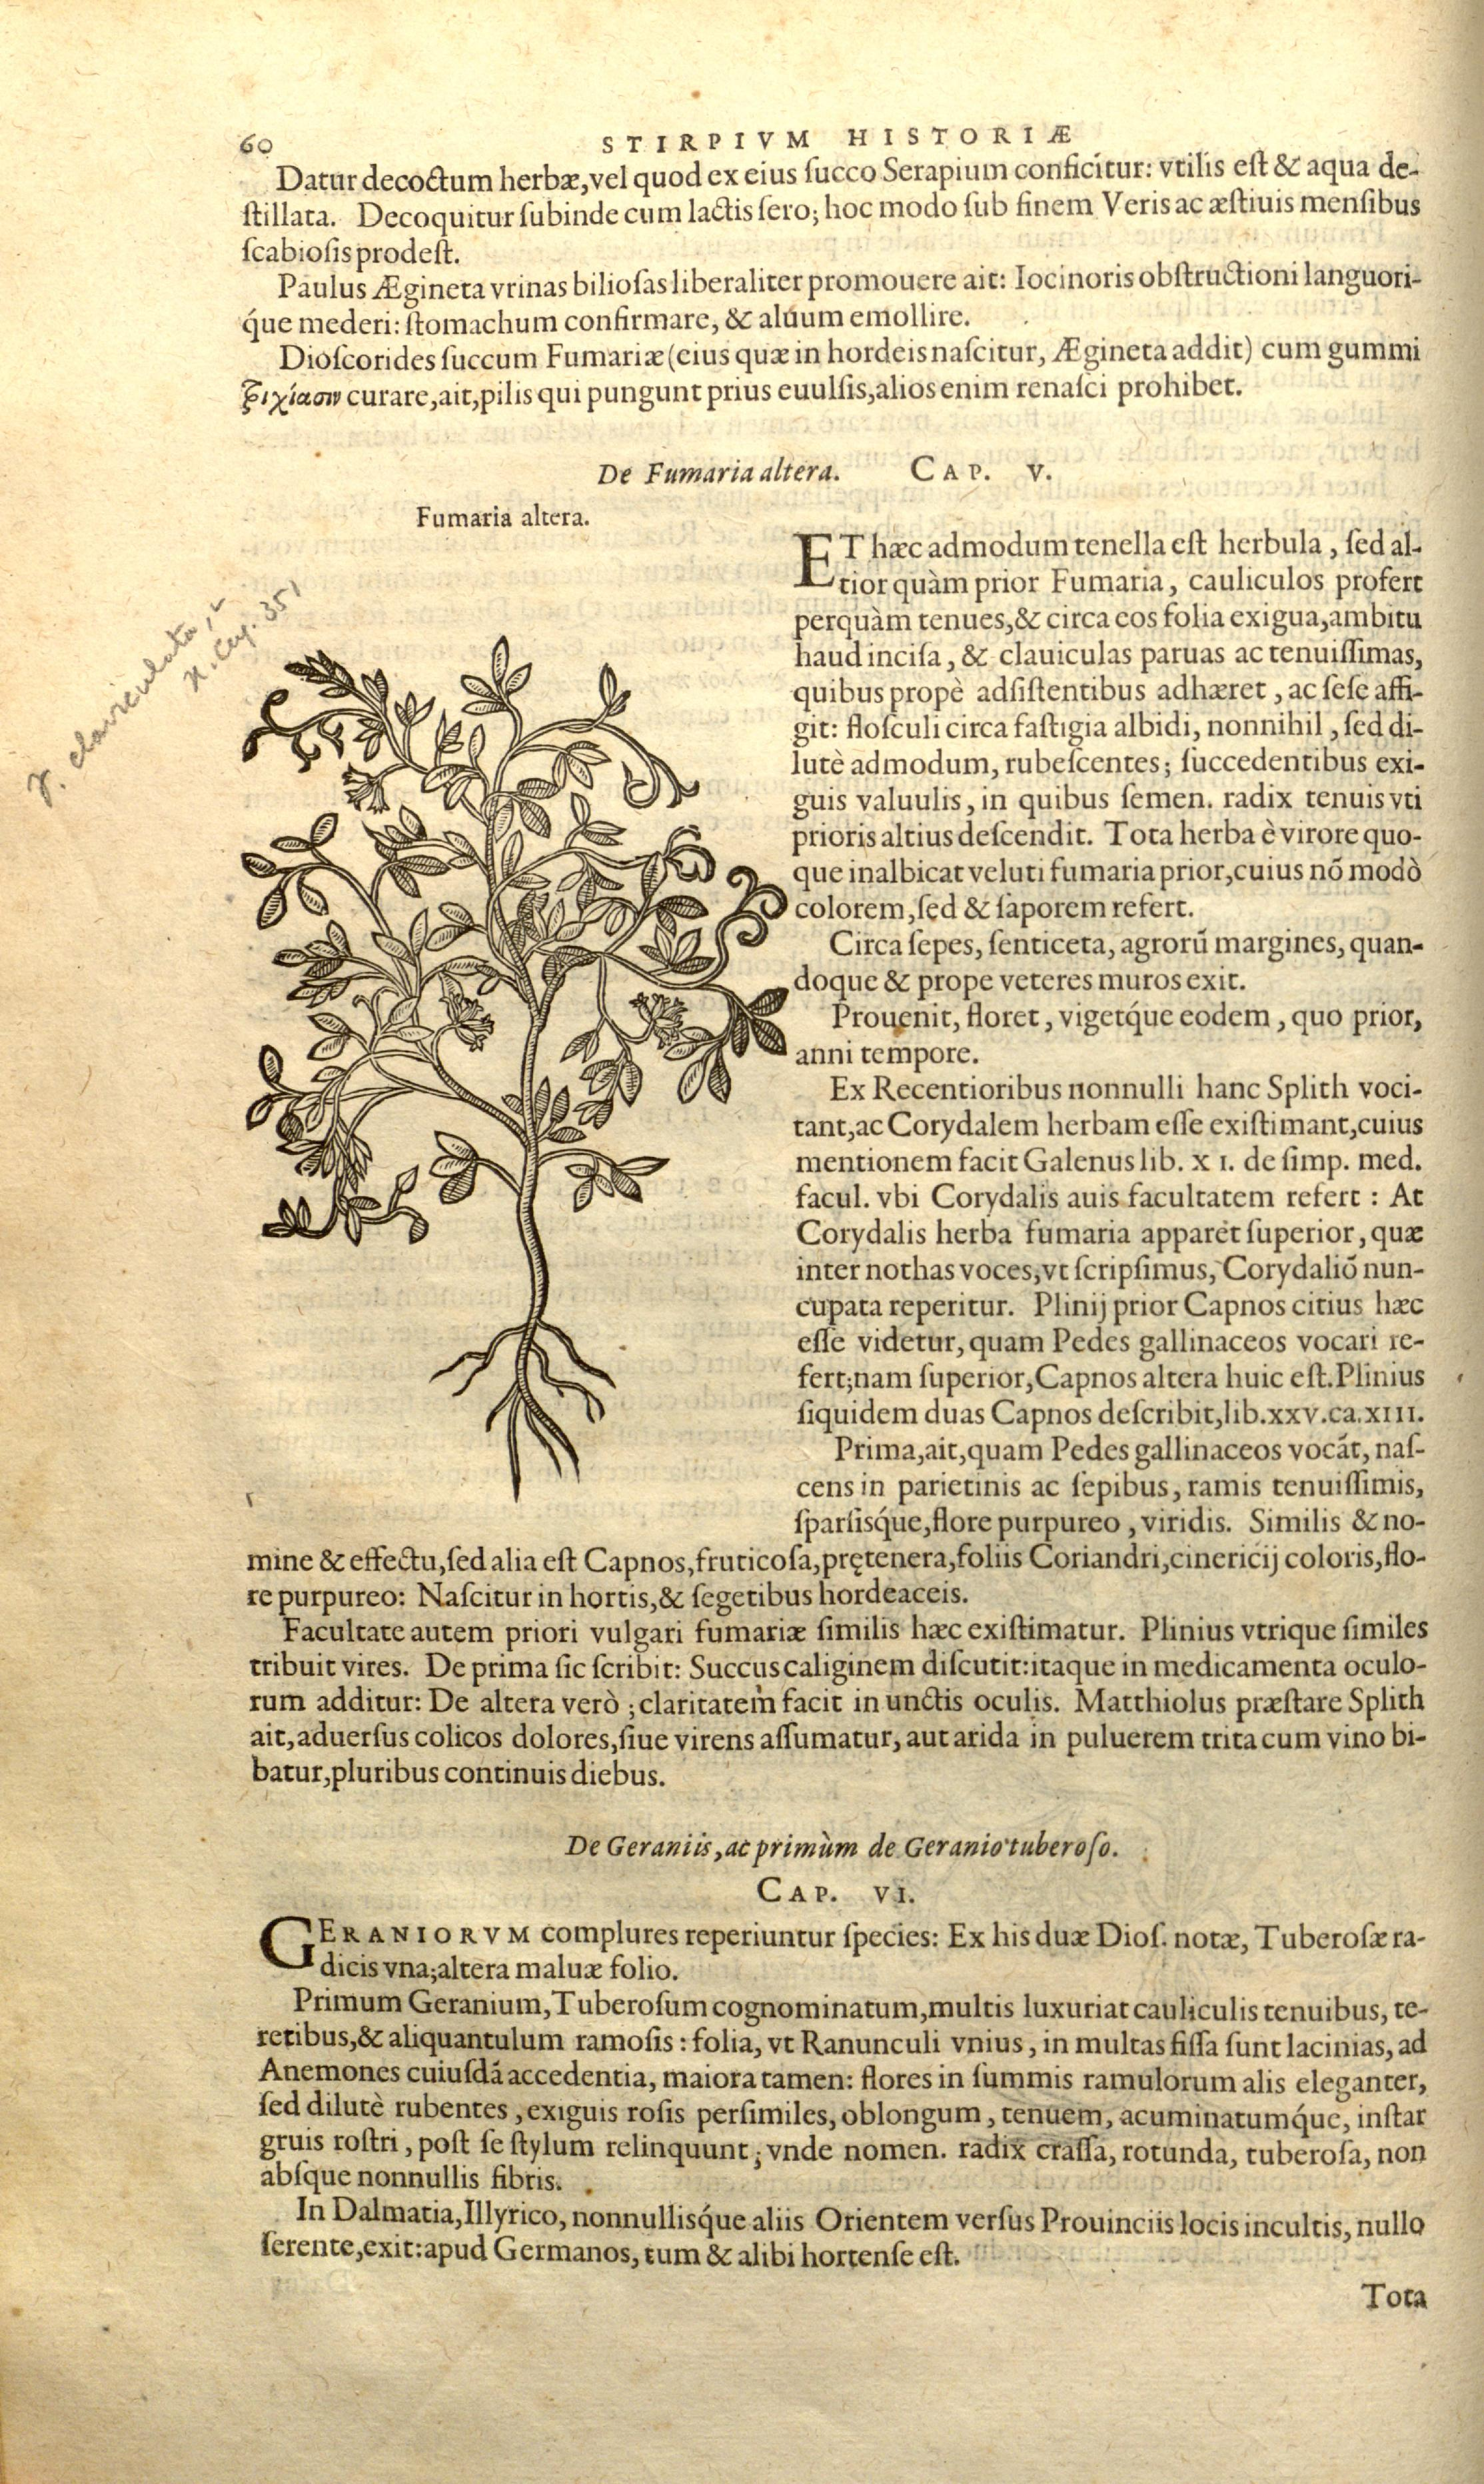 historiae pemptades sex, sive libri XXX (Page 60) BHL8099721.jpg Remberti Dodonaei ... Stirpium historiae pemptades sex, sive libri XXX. Date 1583 Source